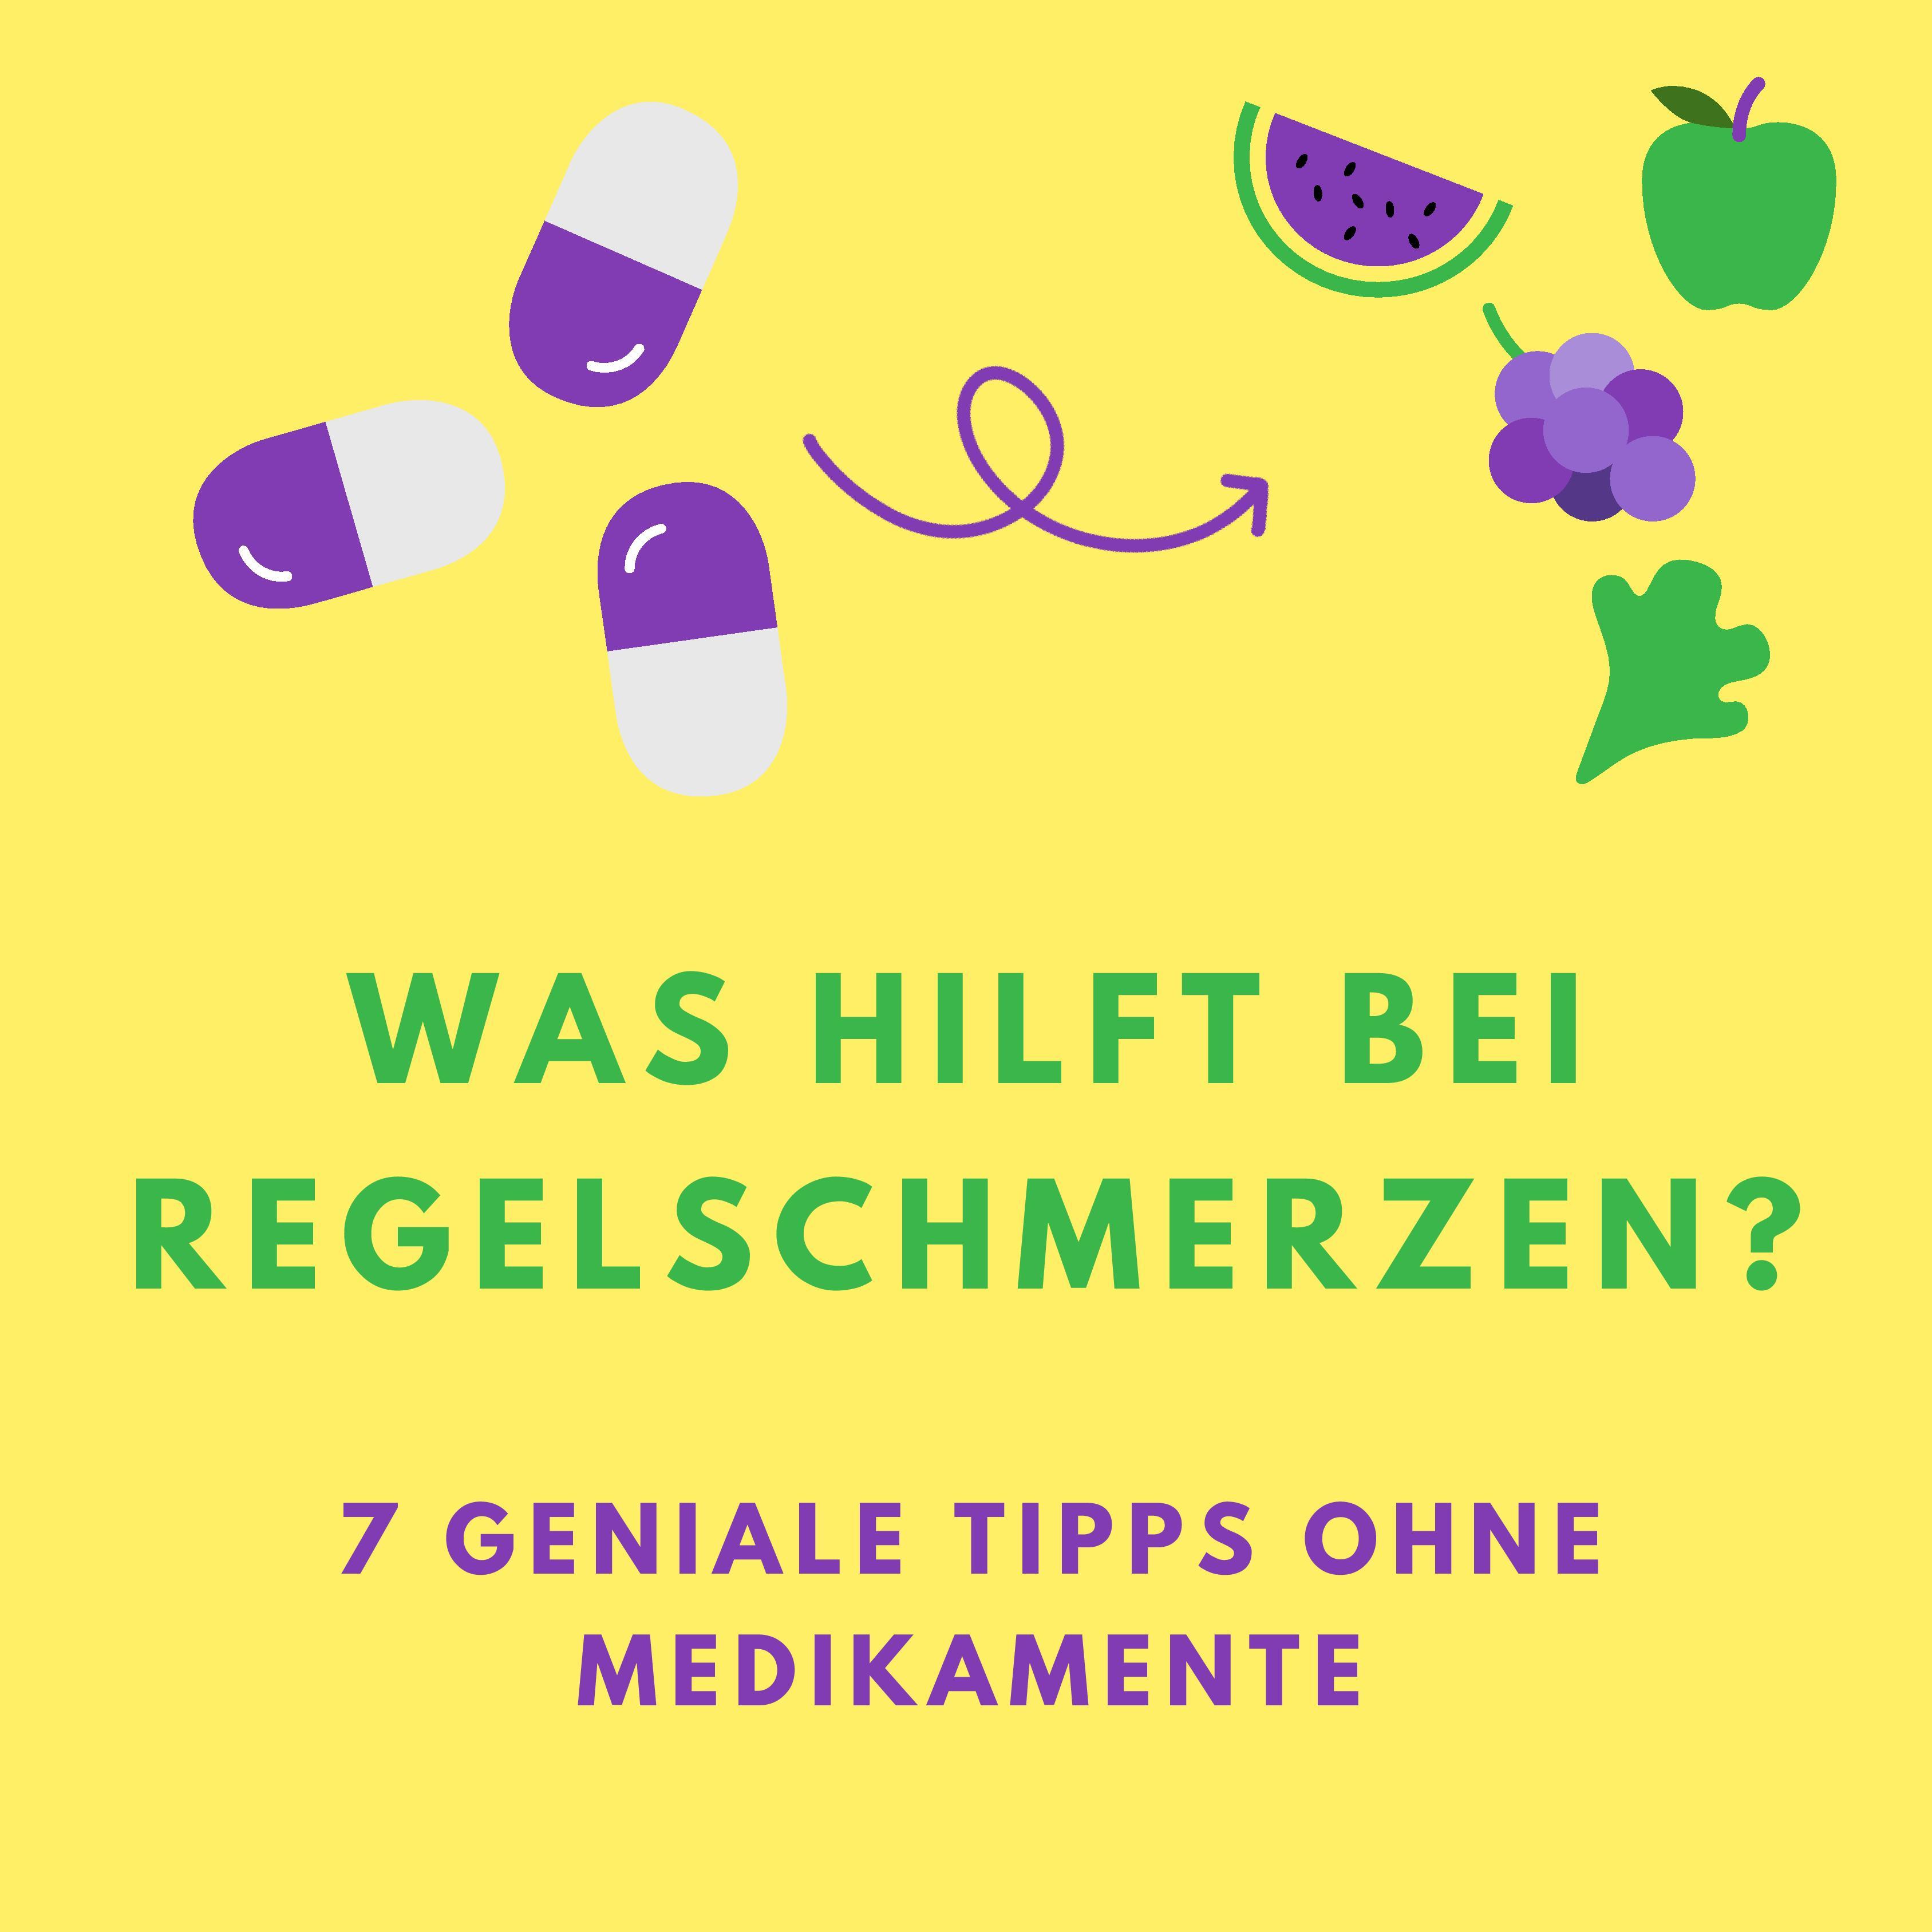 Was hilft bei Regelschmerzen-OWAO!-Meal Prep-Meal Prep vegan-7 geniale Tipps ohne Medikamente